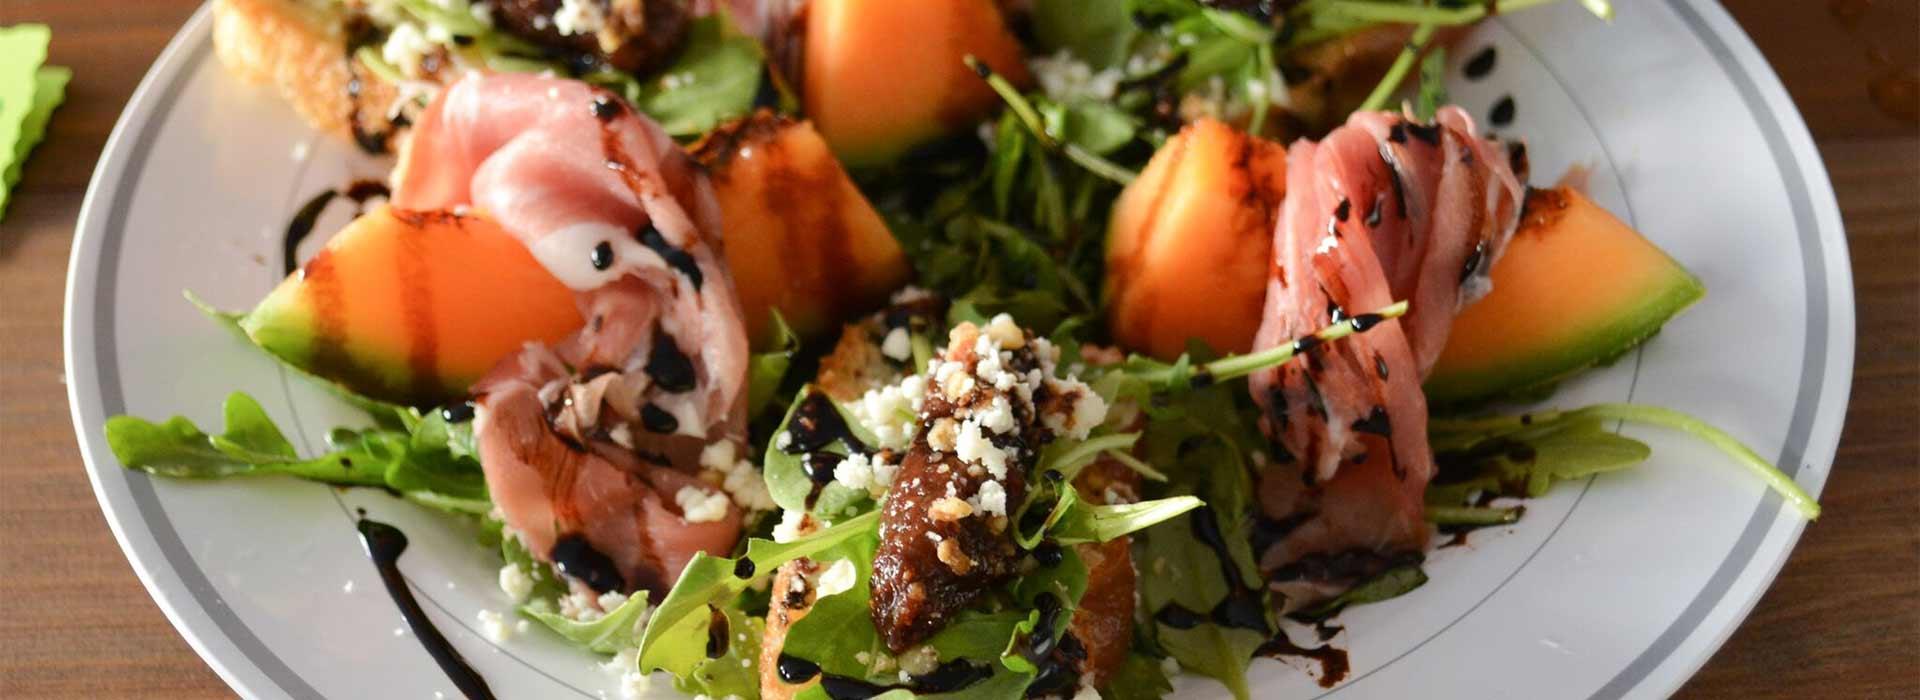 food from savor Fuquay-Varina